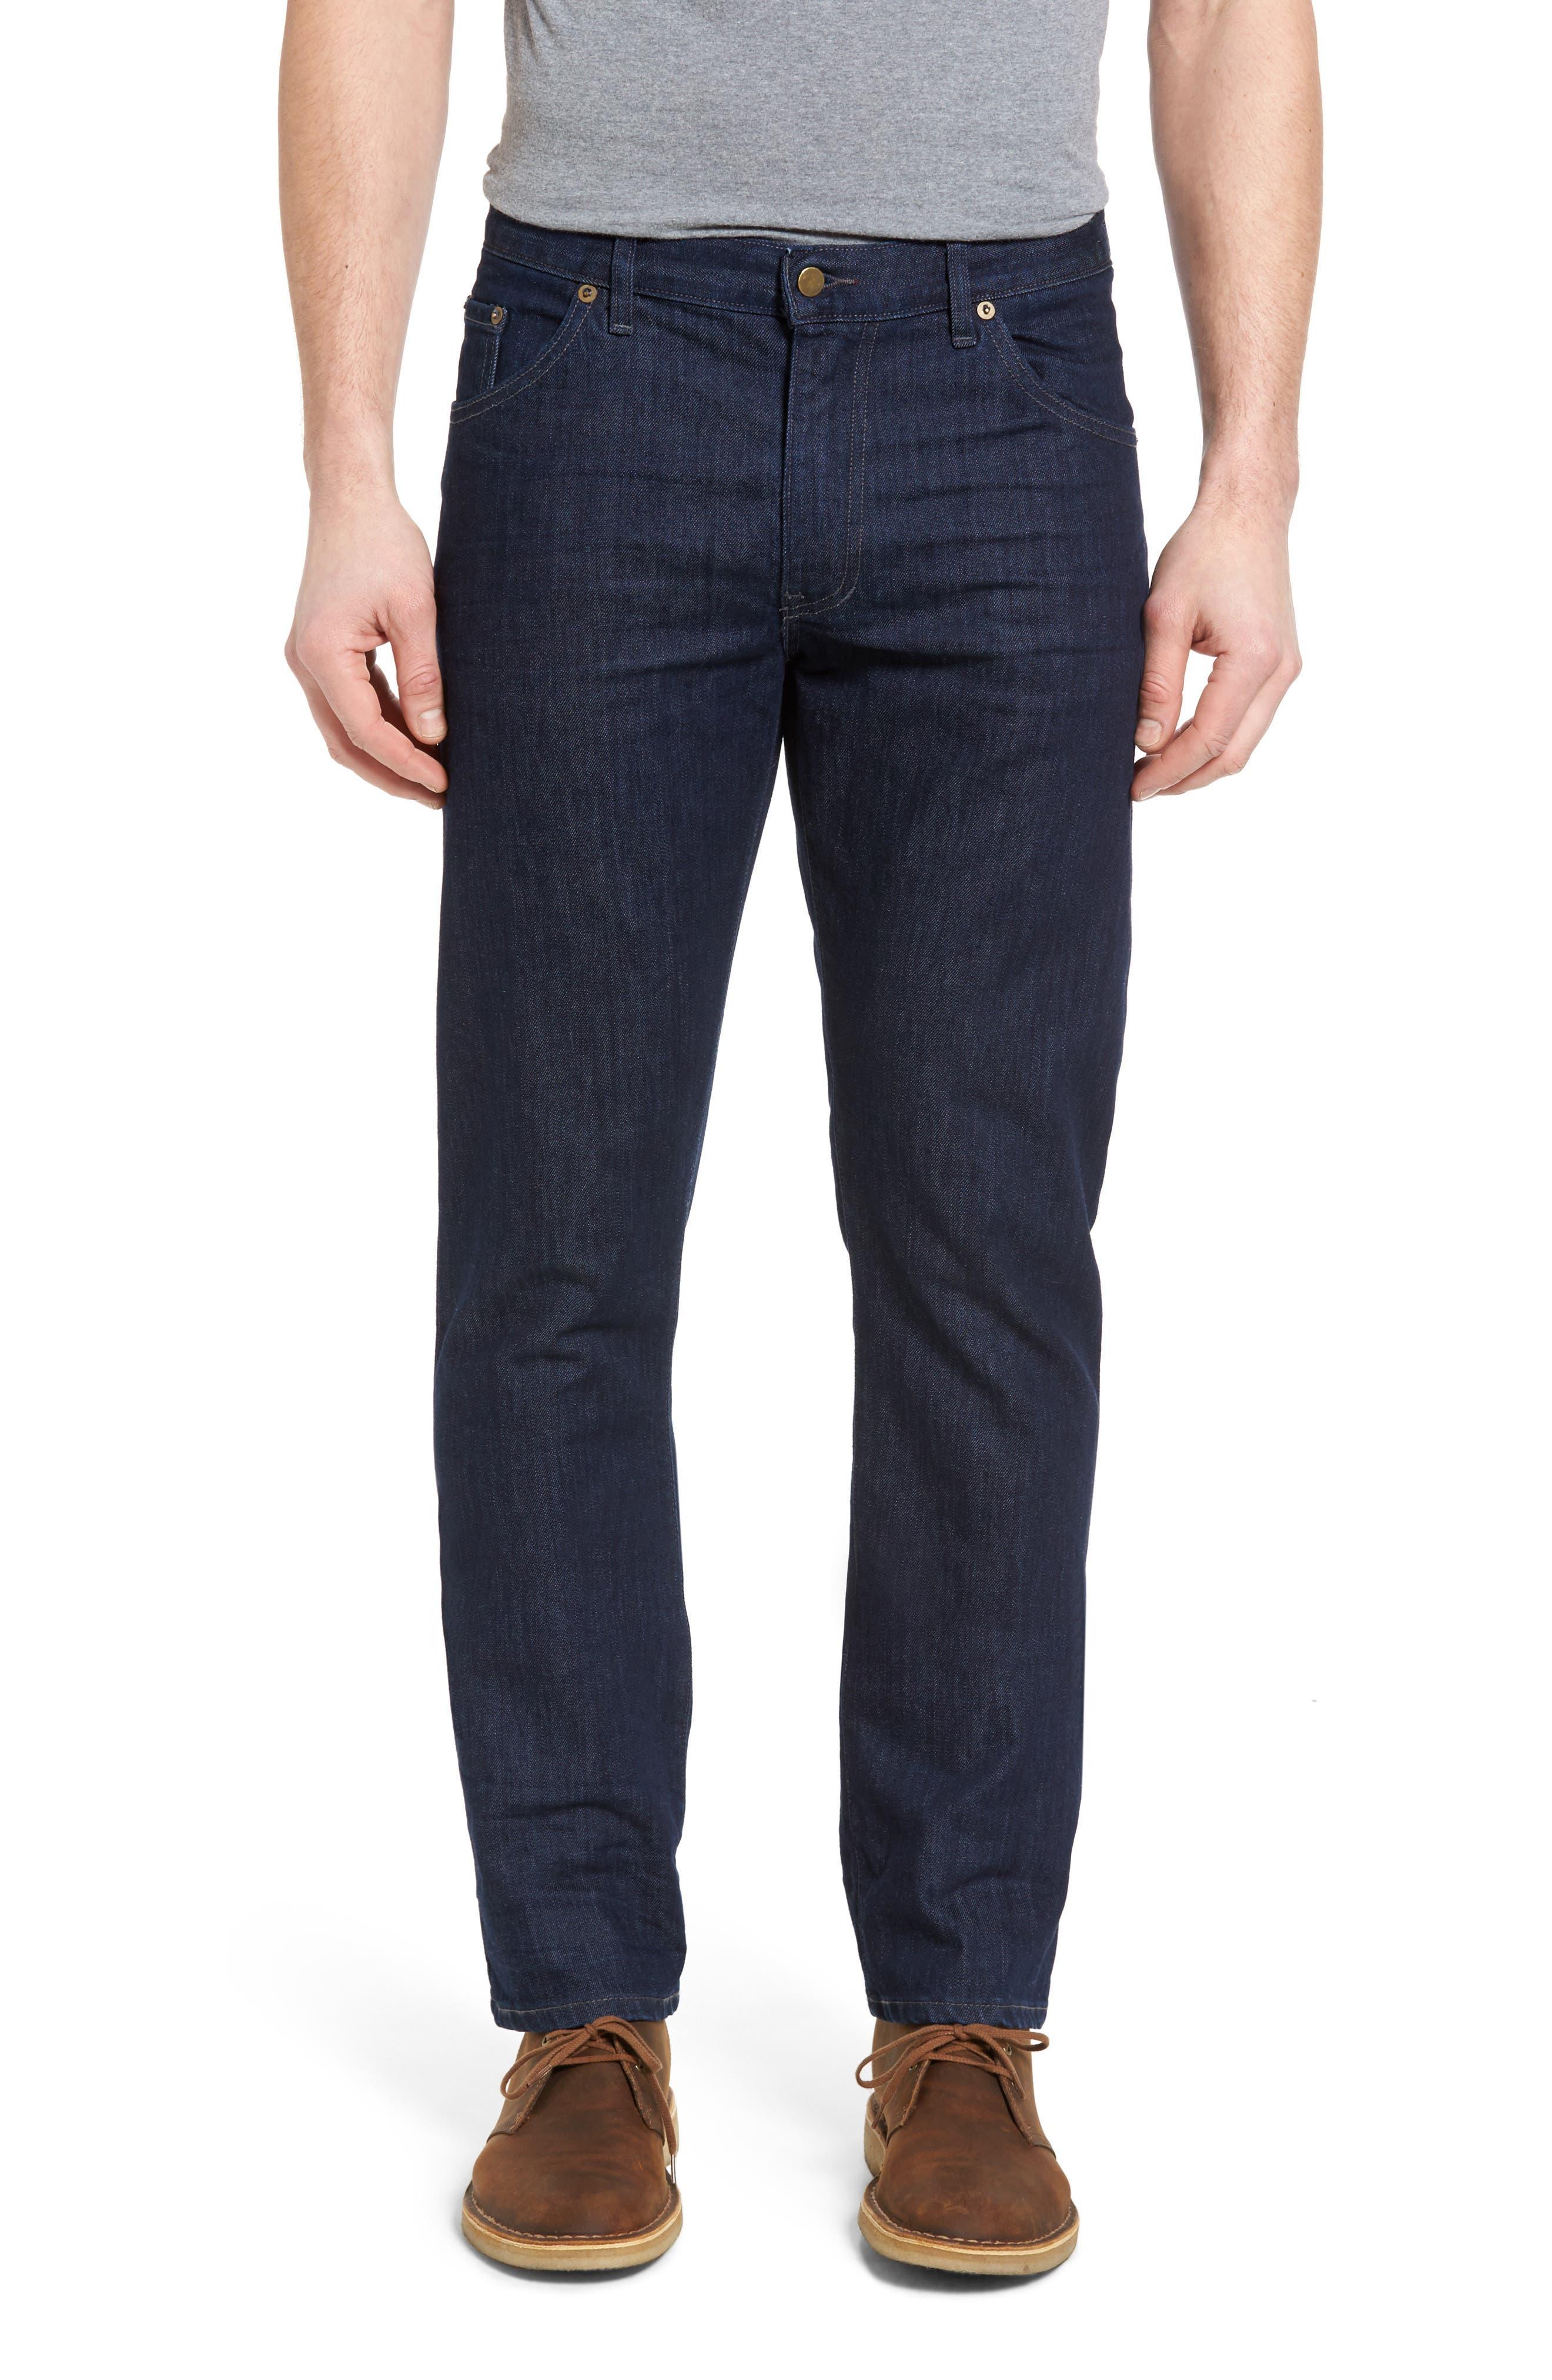 Jones Slim Fit Jeans,                         Main,                         color, 418